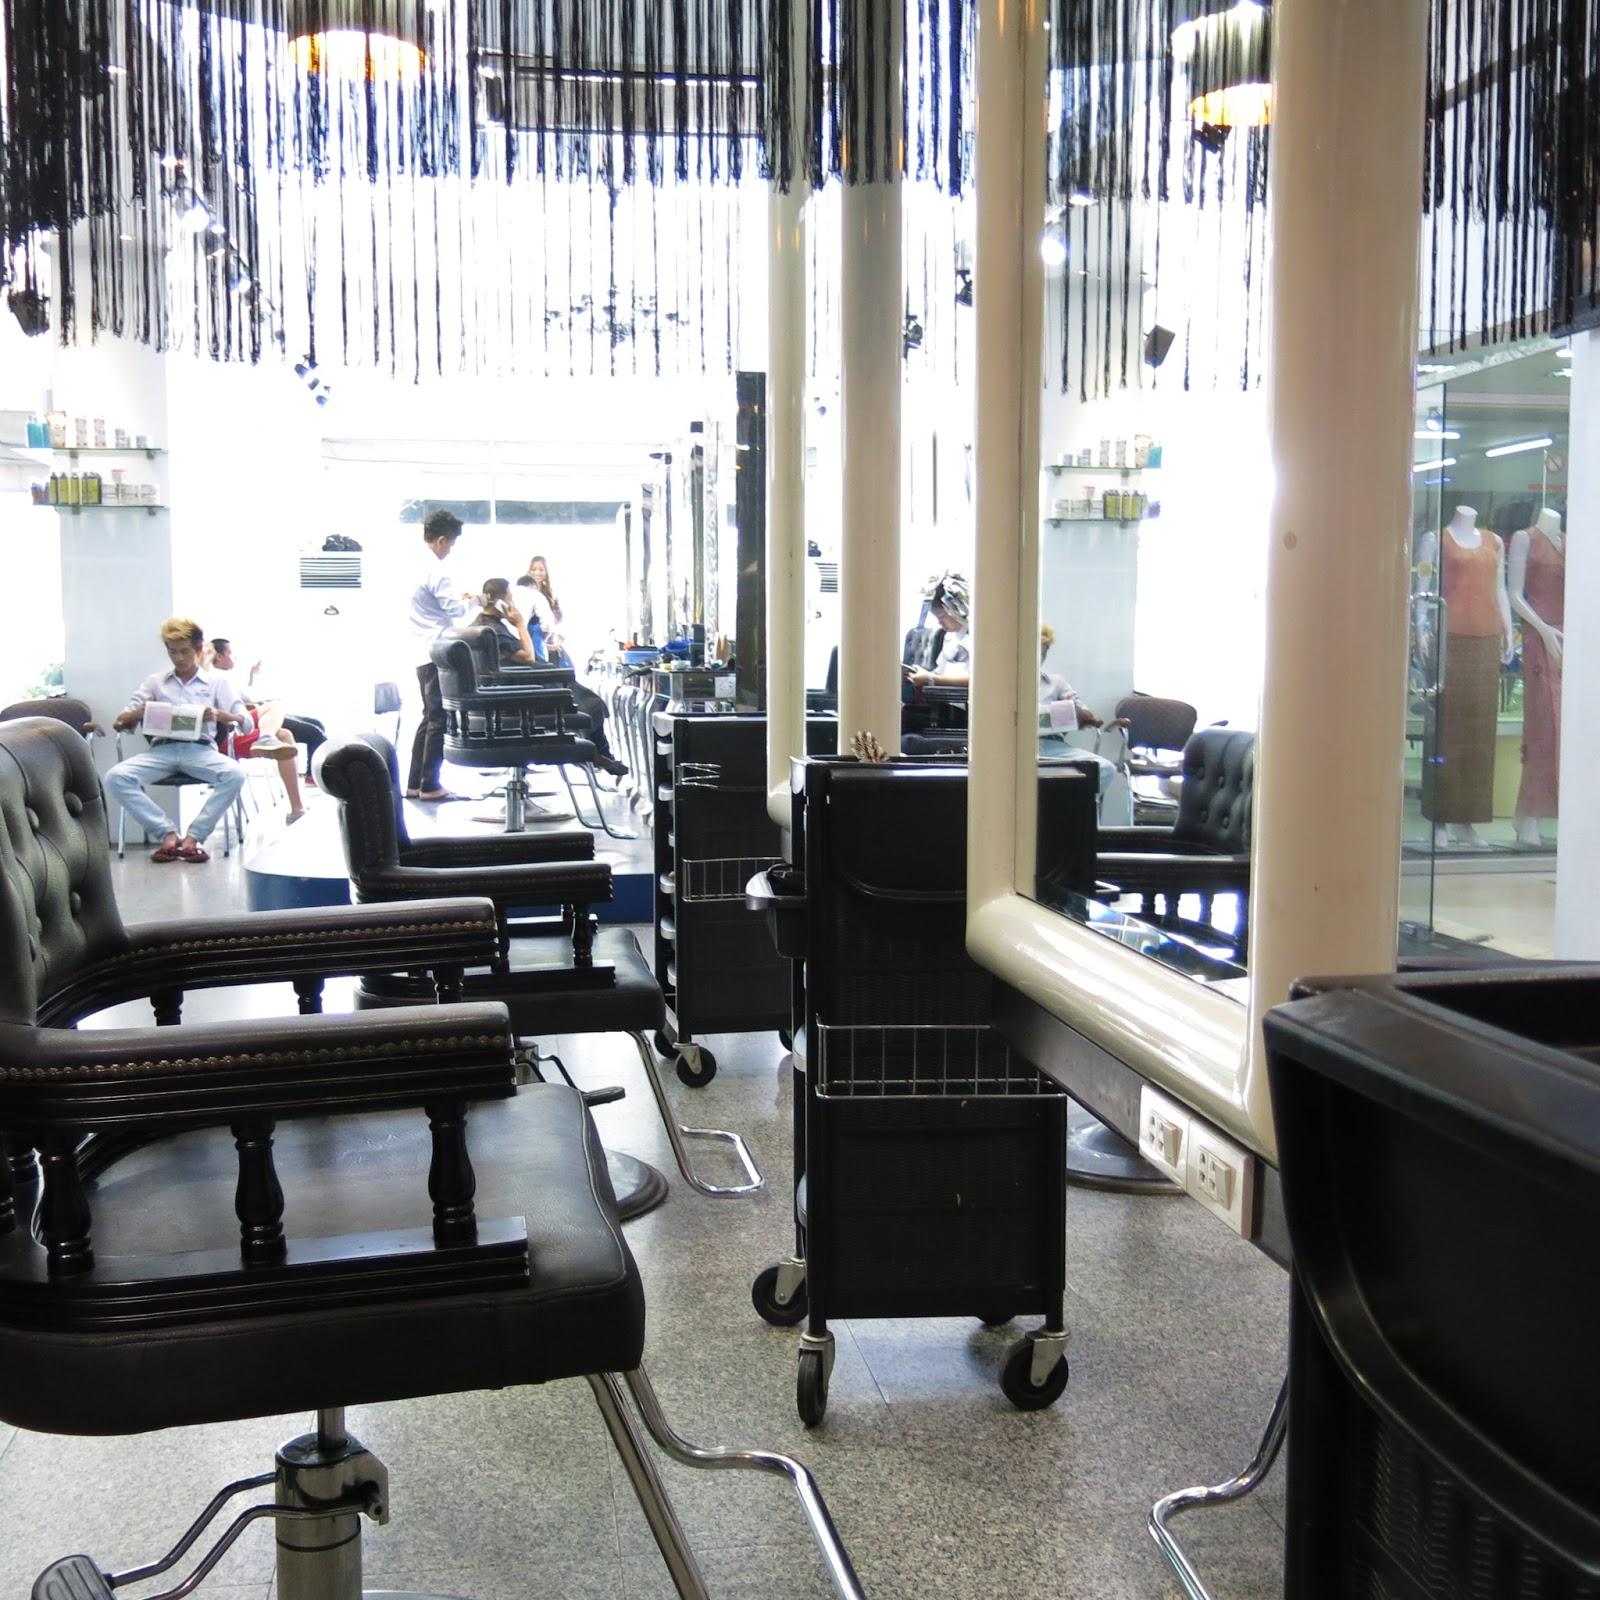 Office Chair Yangon Cover Rental Orlando Fl Missyimply Tony Tun Hair Salon And Acacia Tea Even The Is So Classy Vintage Ish